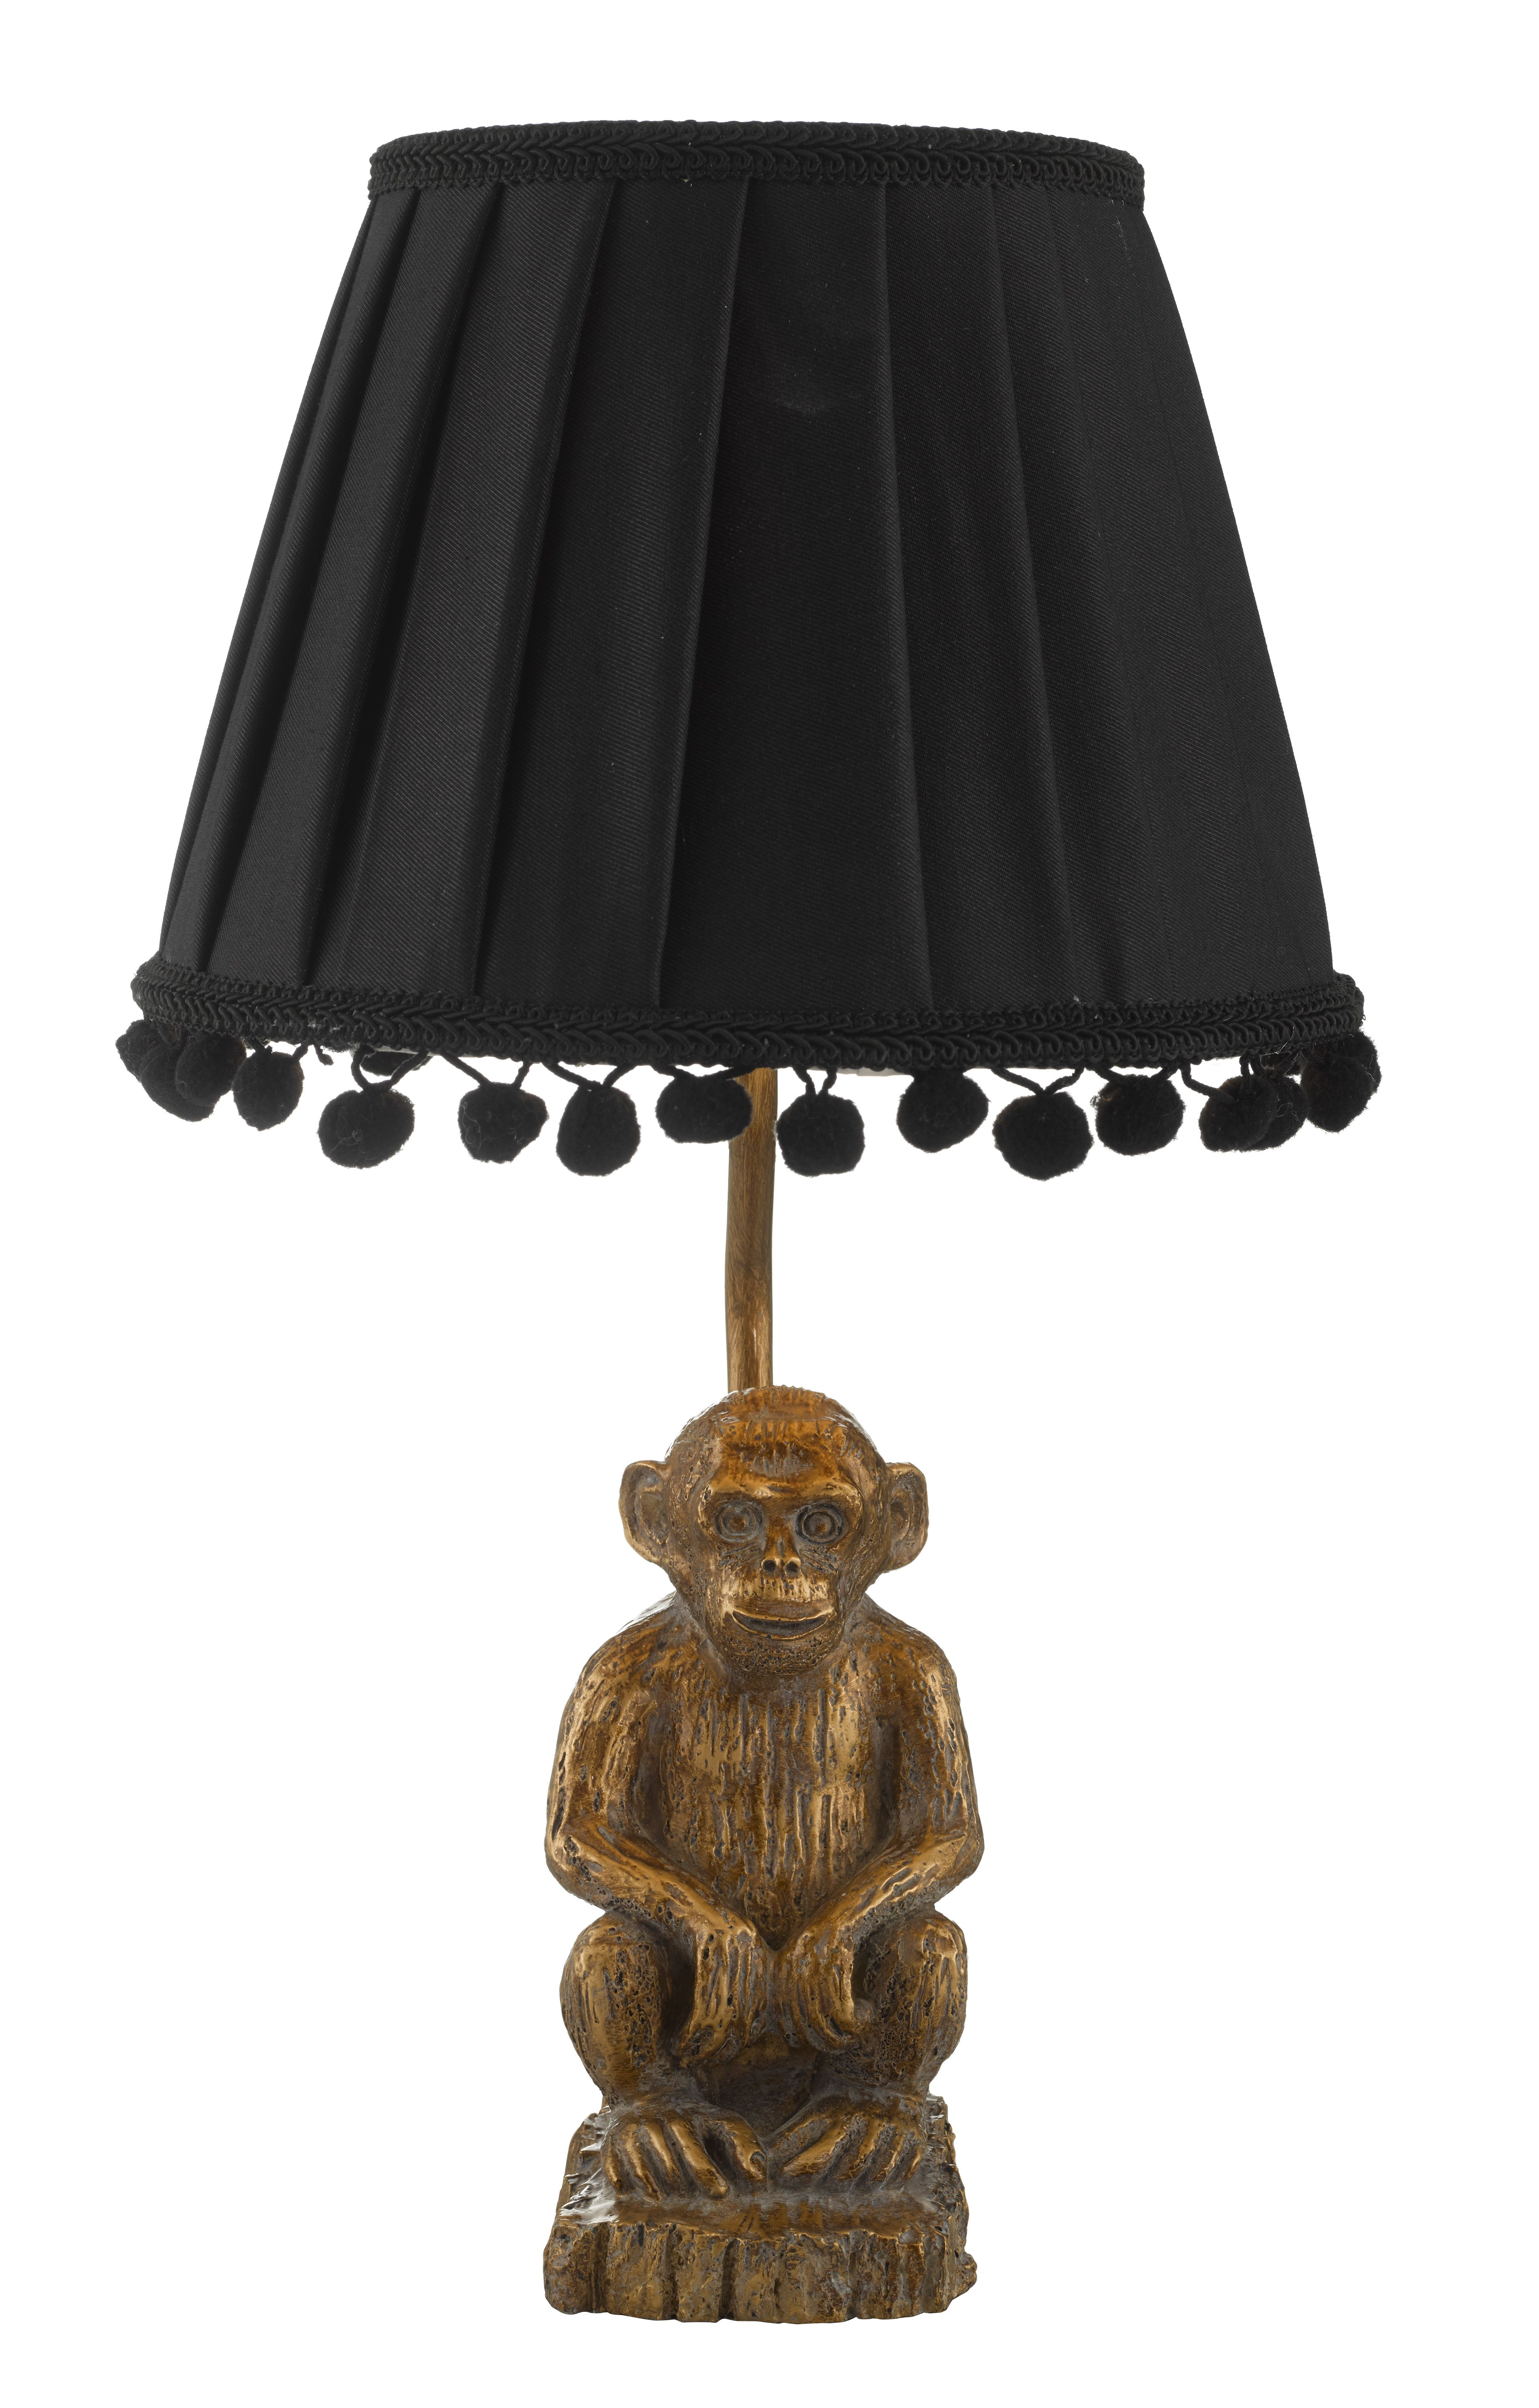 Abu monkey table lamp lightingideas industrialinterior abu monkey table lamp lightingideas industrialinterior ceilinglights debenhams lighting interiors aloadofball Gallery